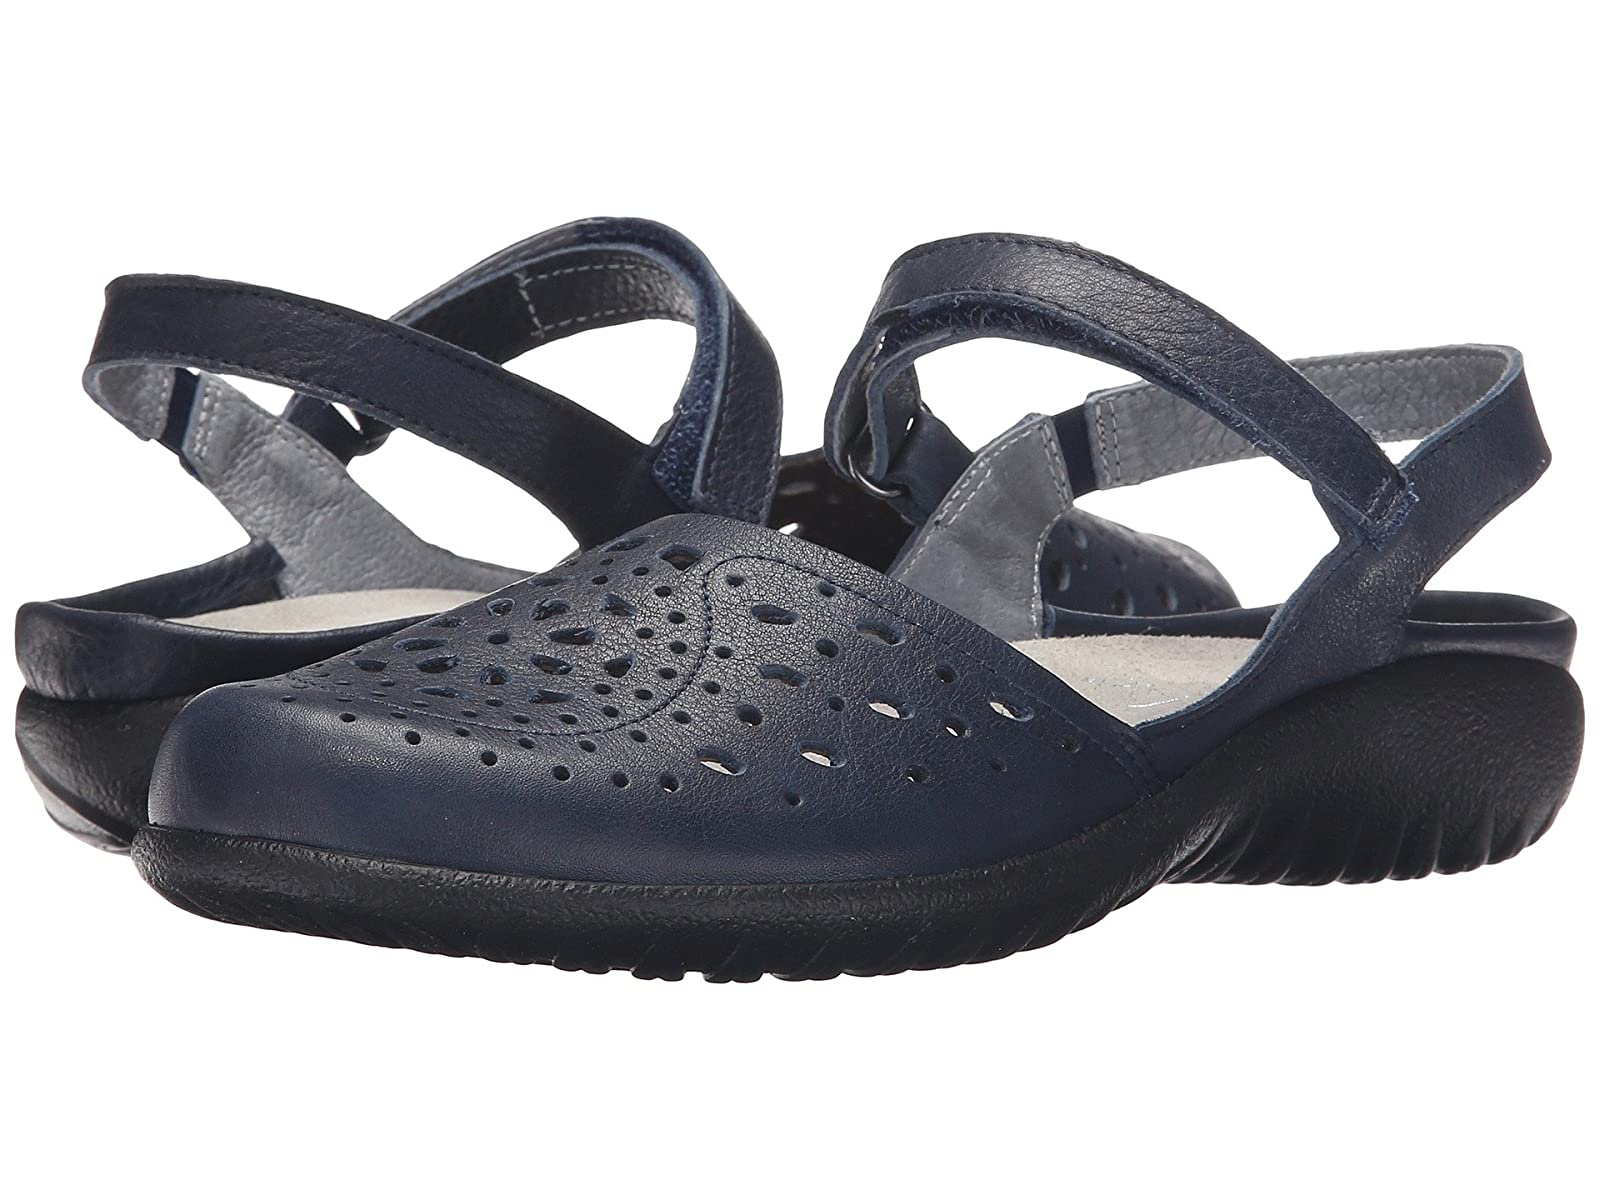 Naot AratakiAtmospheric grades have affordable shoes